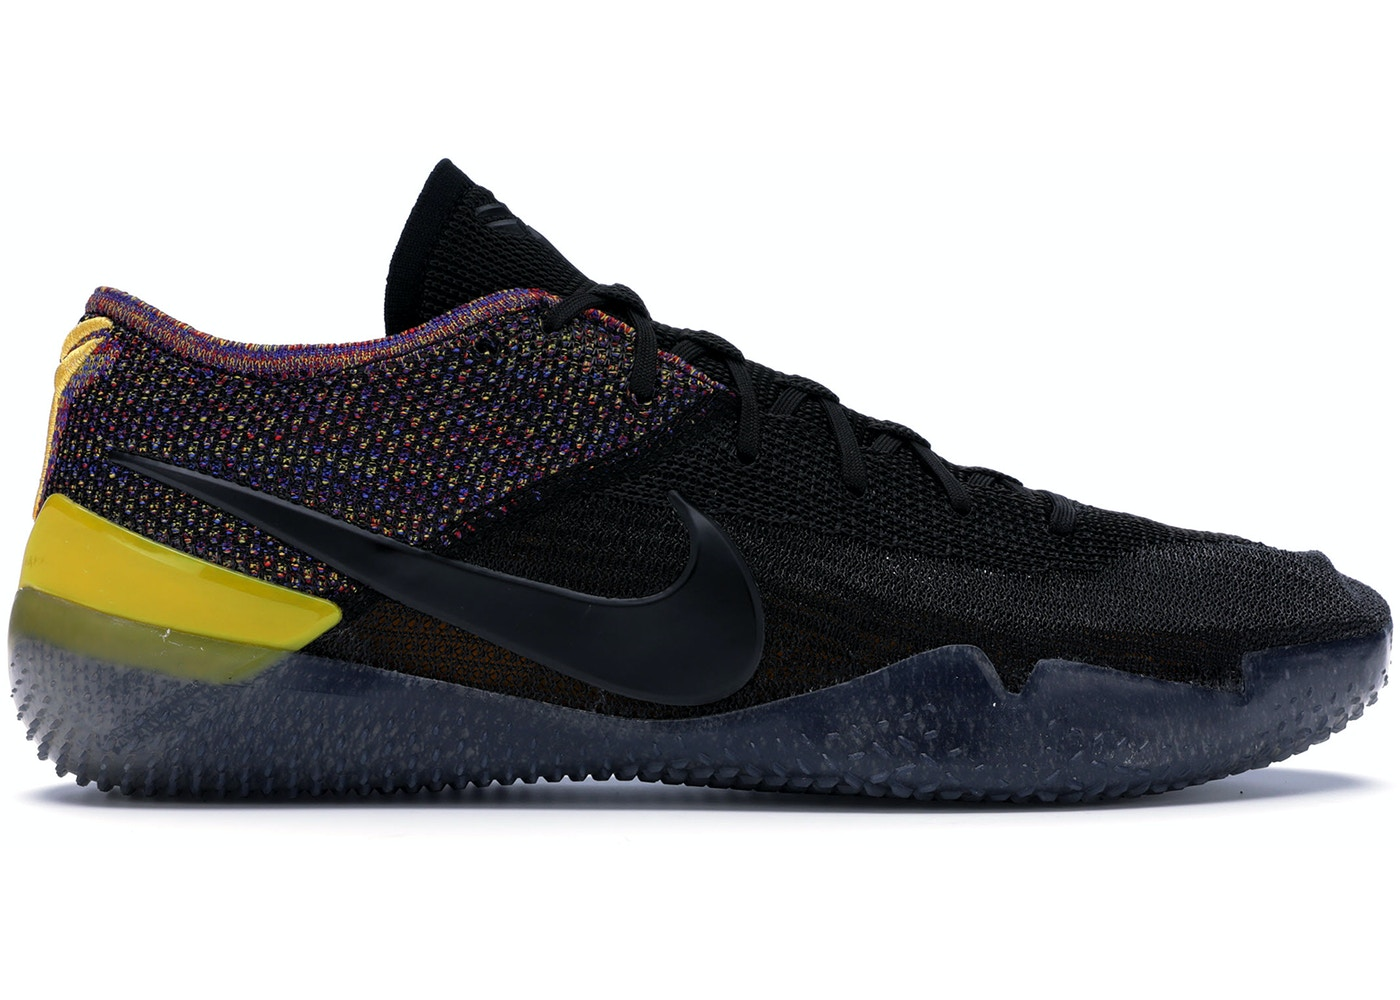 newest a6655 c5152 Buy Nike Kobe Shoes   Deadstock Sneakers